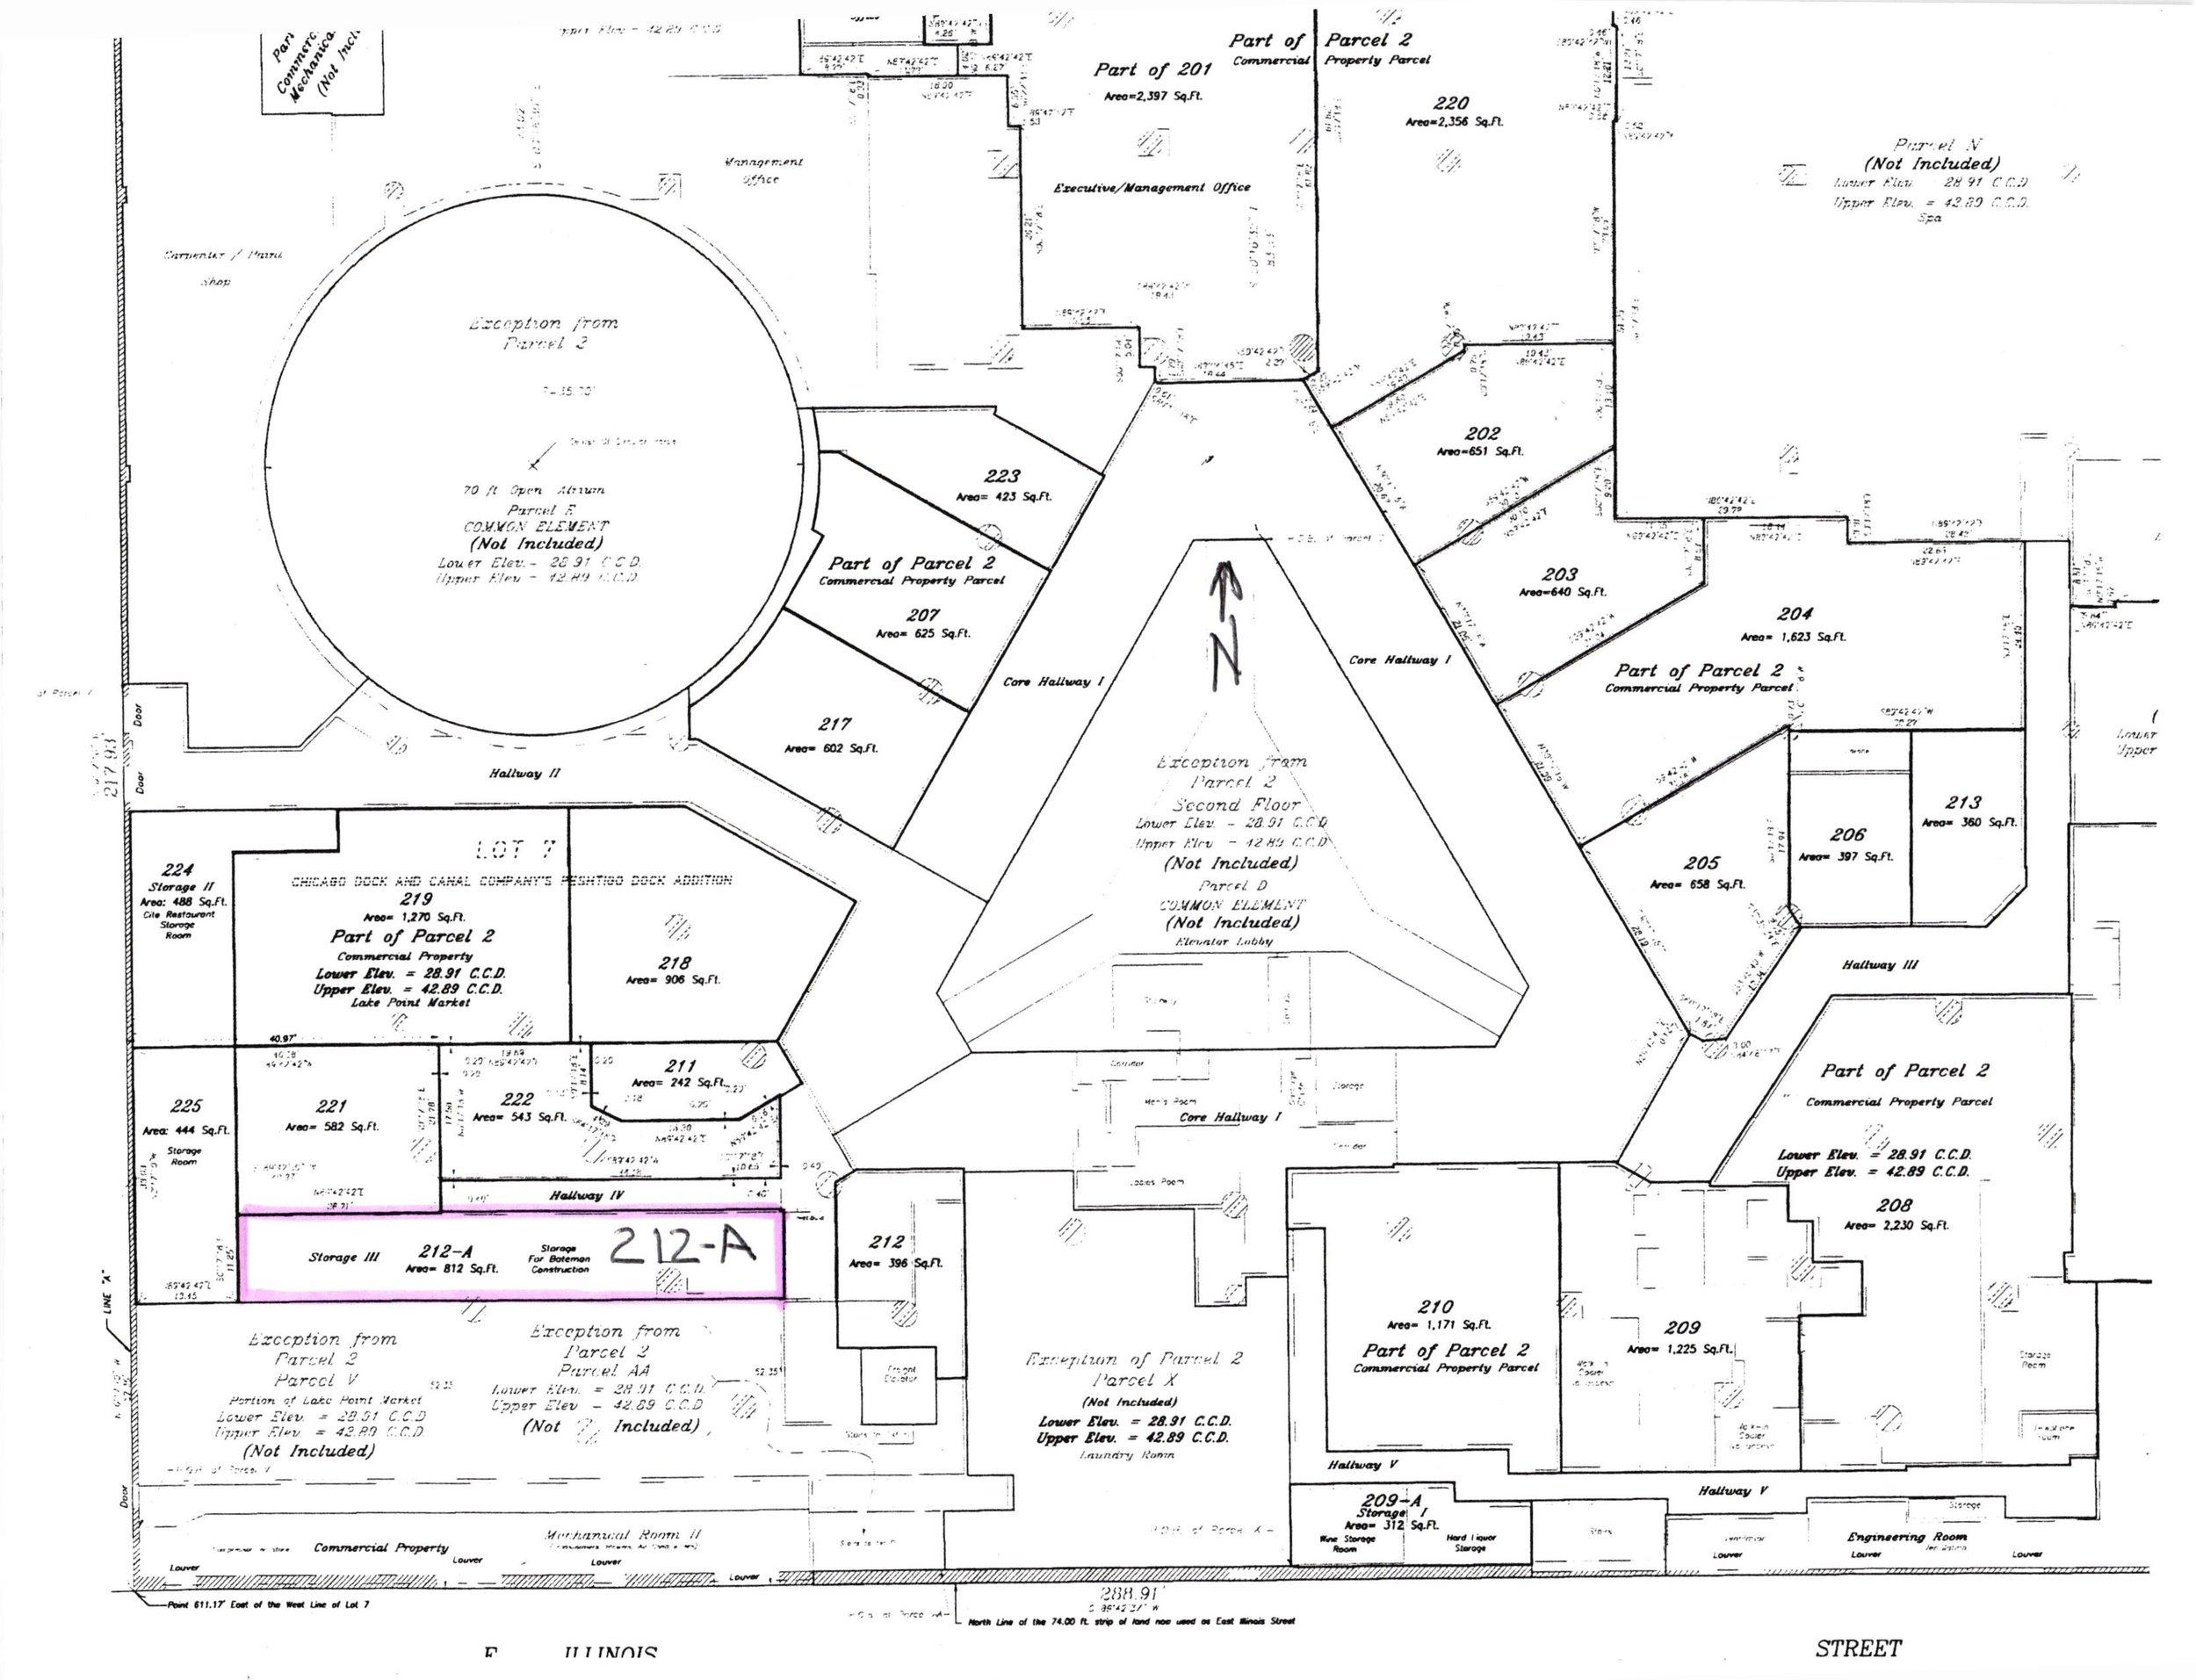 LPTRP-suite 212A-location.jpg